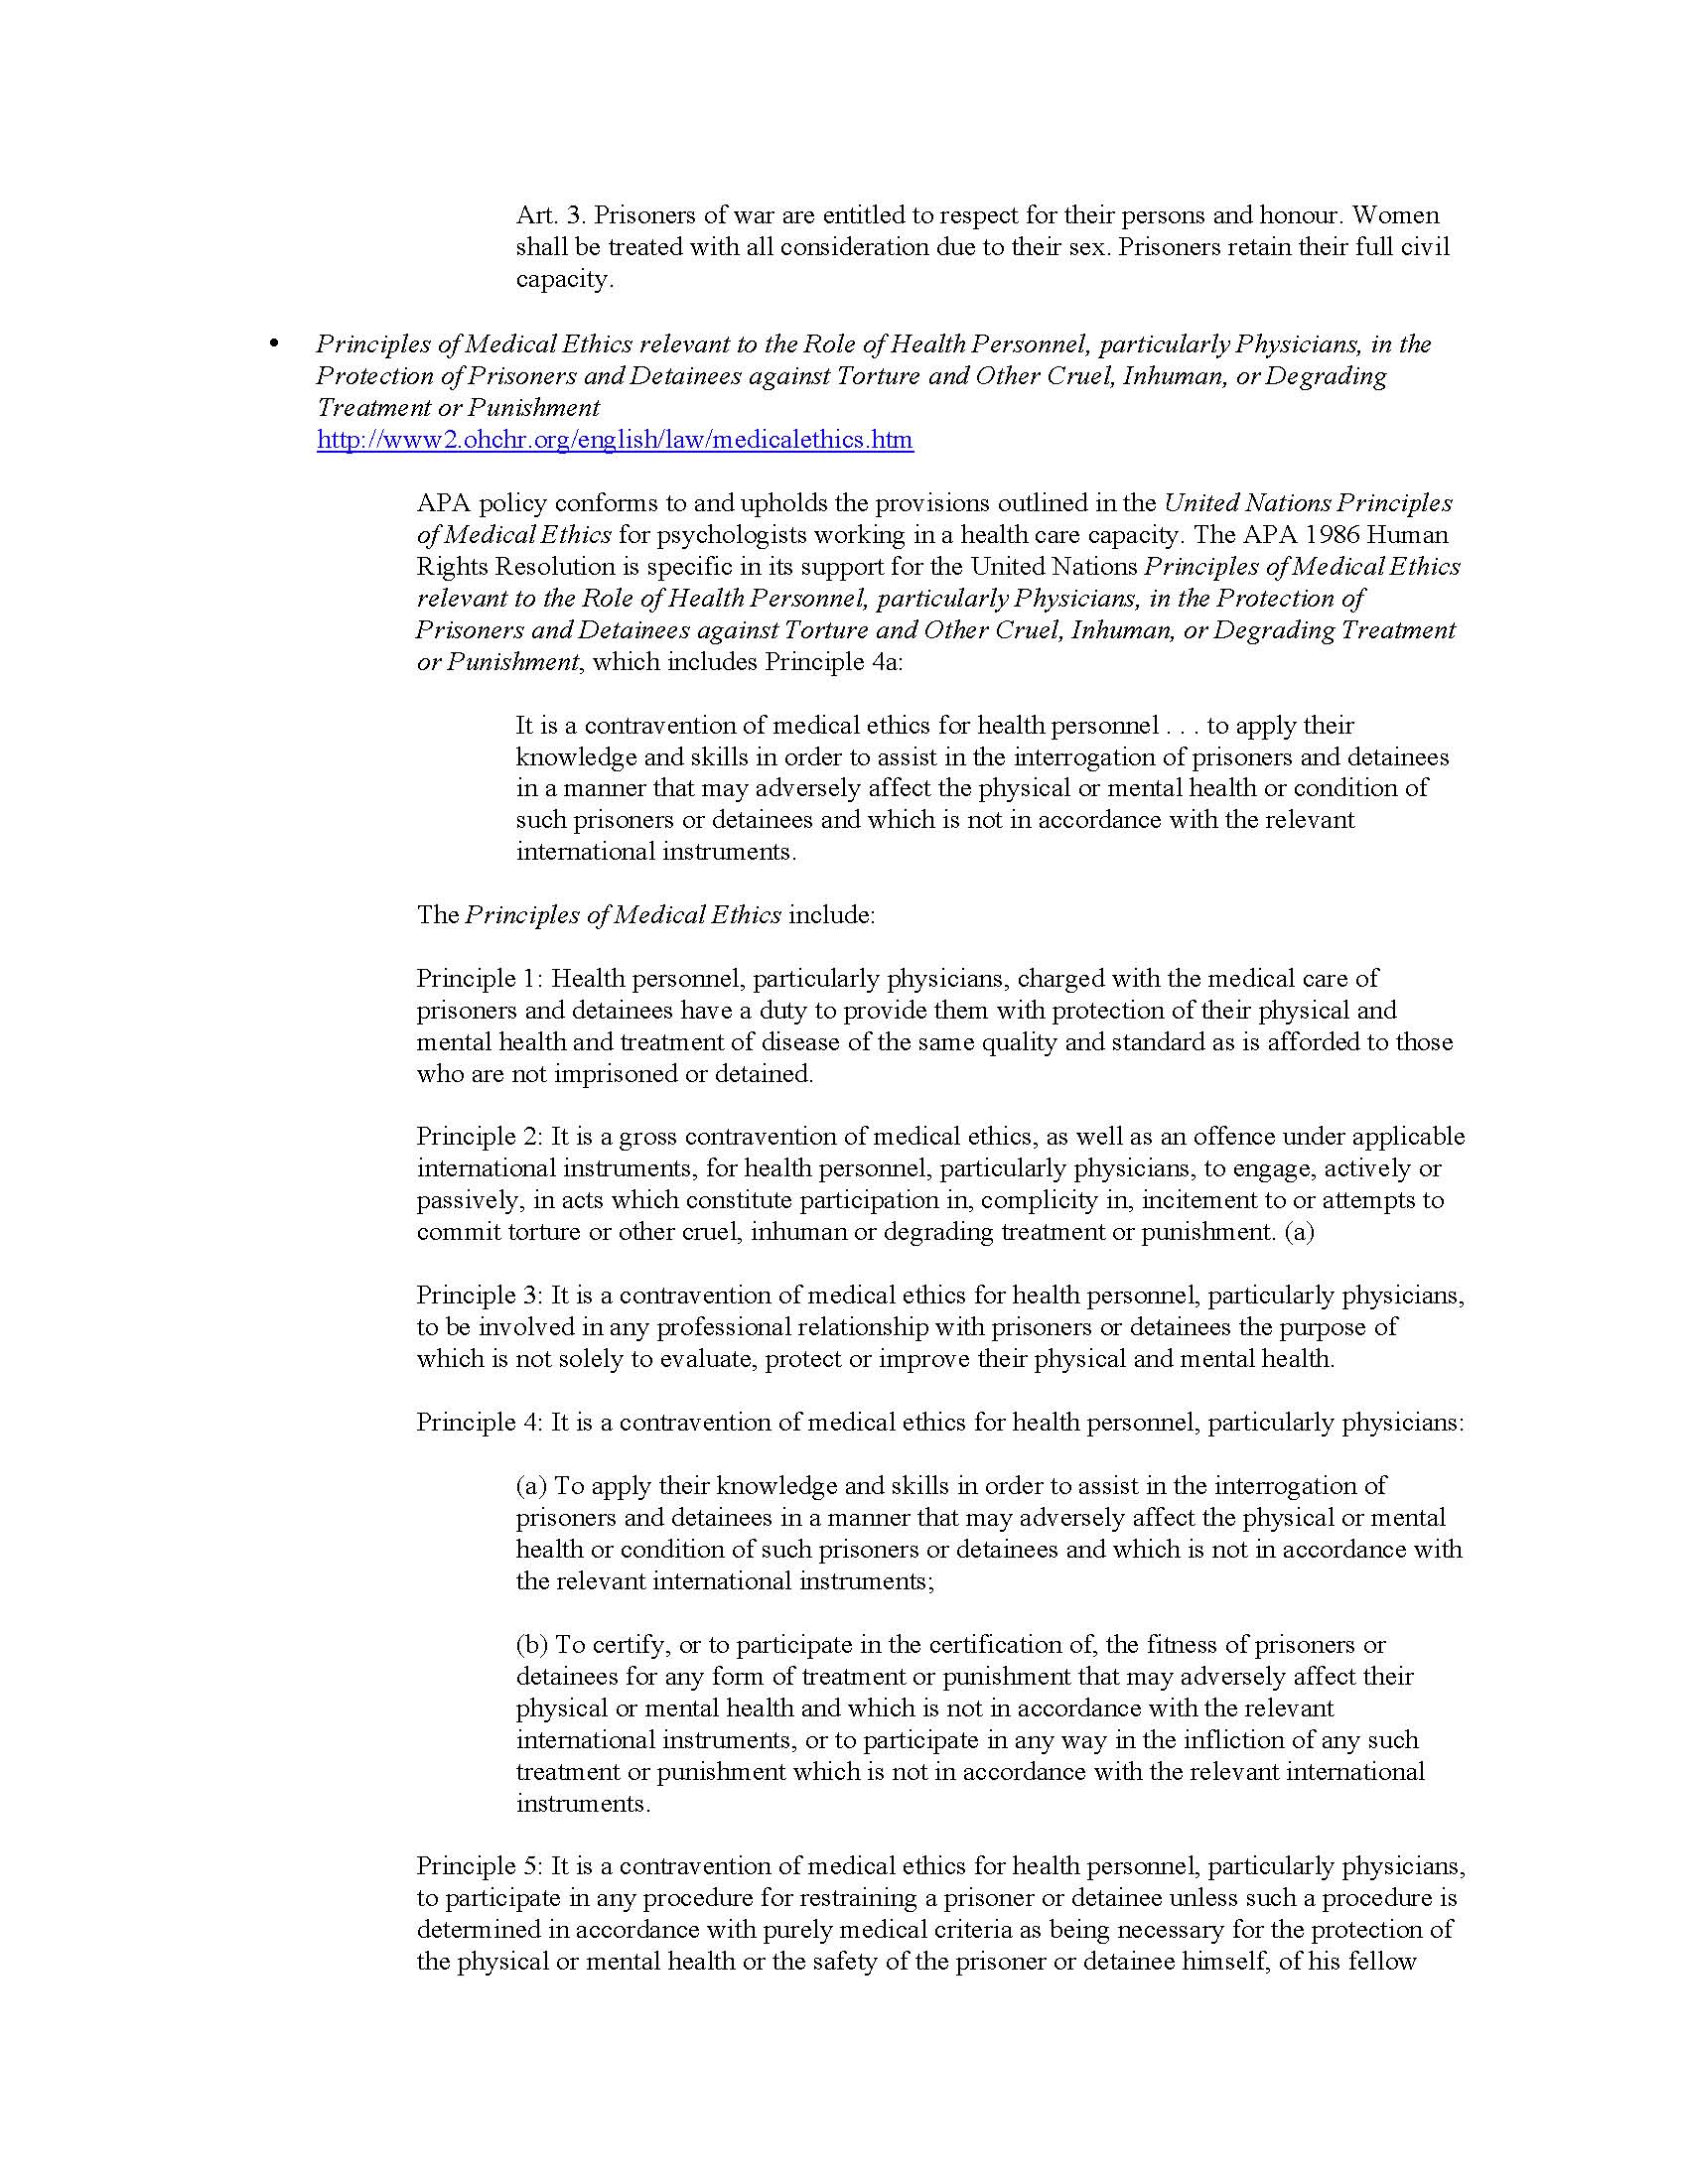 Reconciledpolicyfinalreportfeb2013page18g draft ii january 2013 1betcityfo Choice Image